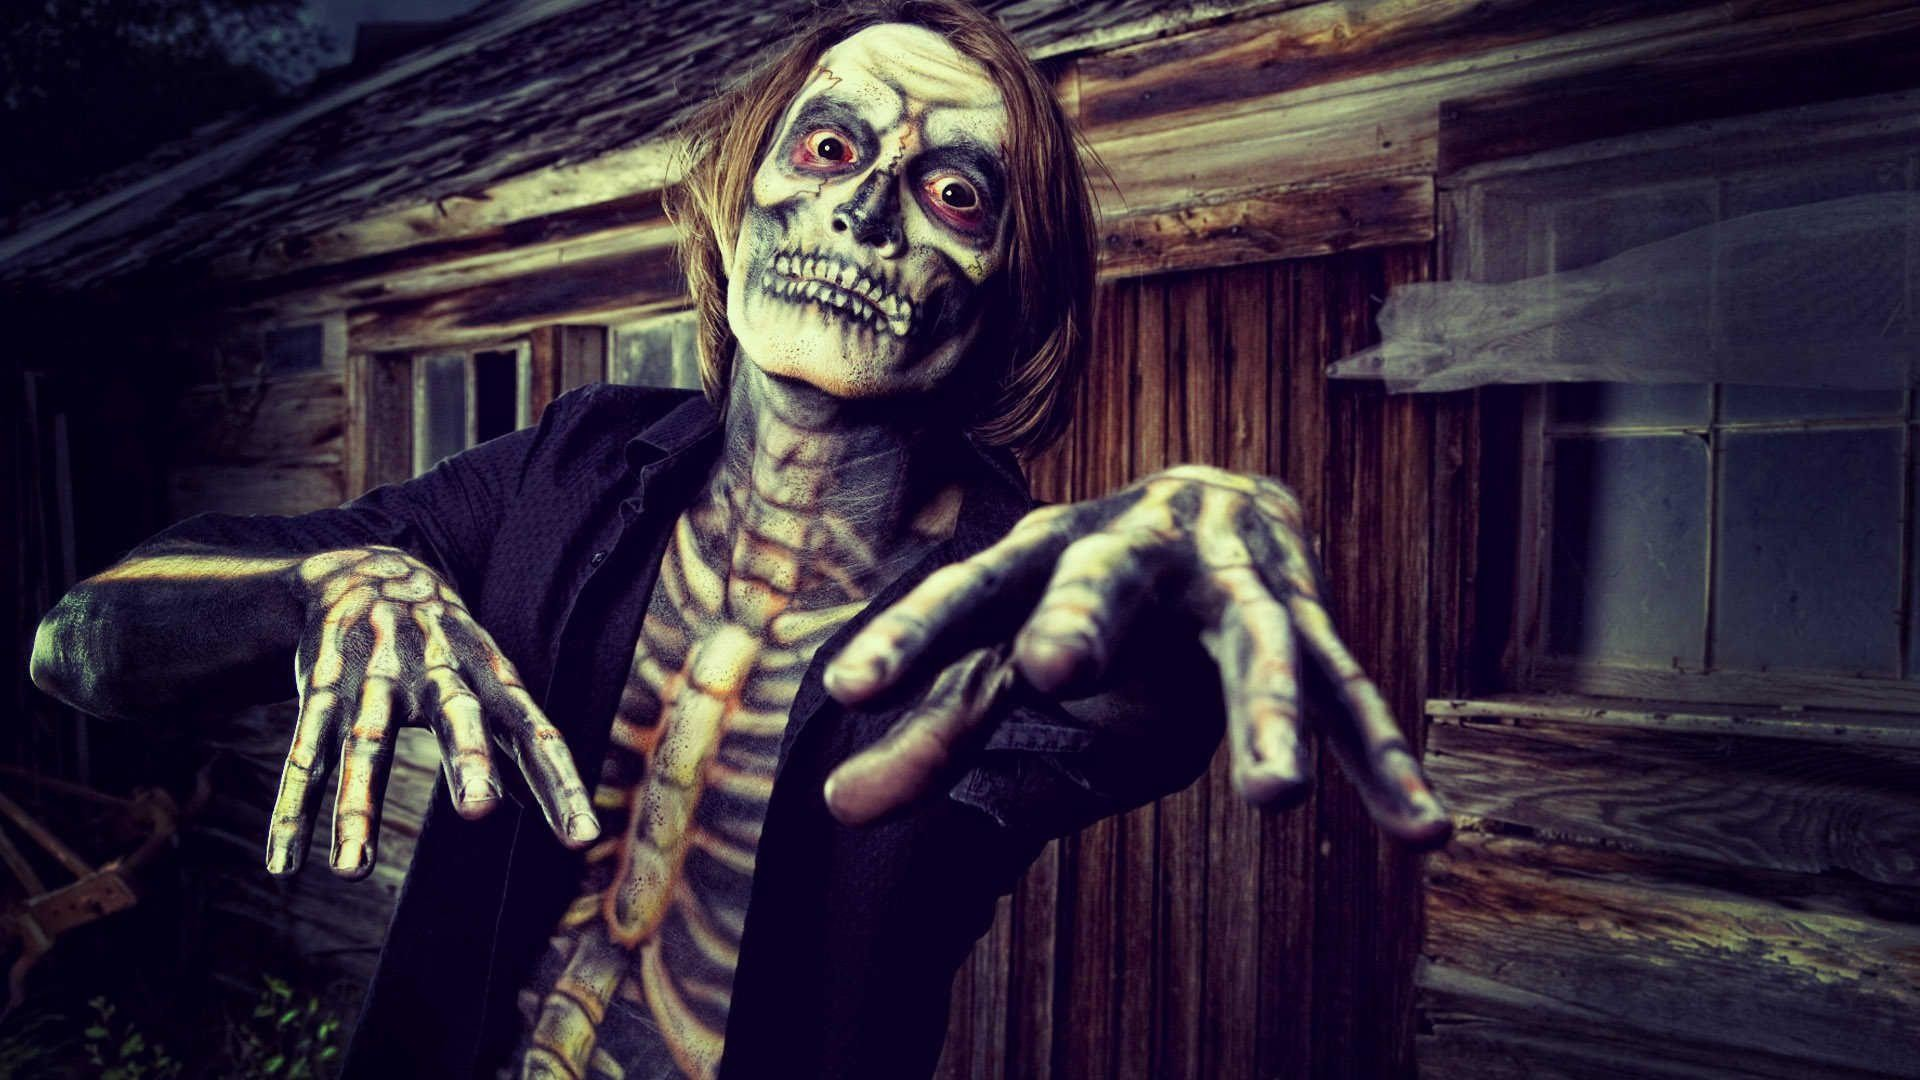 Download Free Wallpapers Horror Wallpapers: Scary Halloween Desktop Wallpaper ·① WallpaperTag